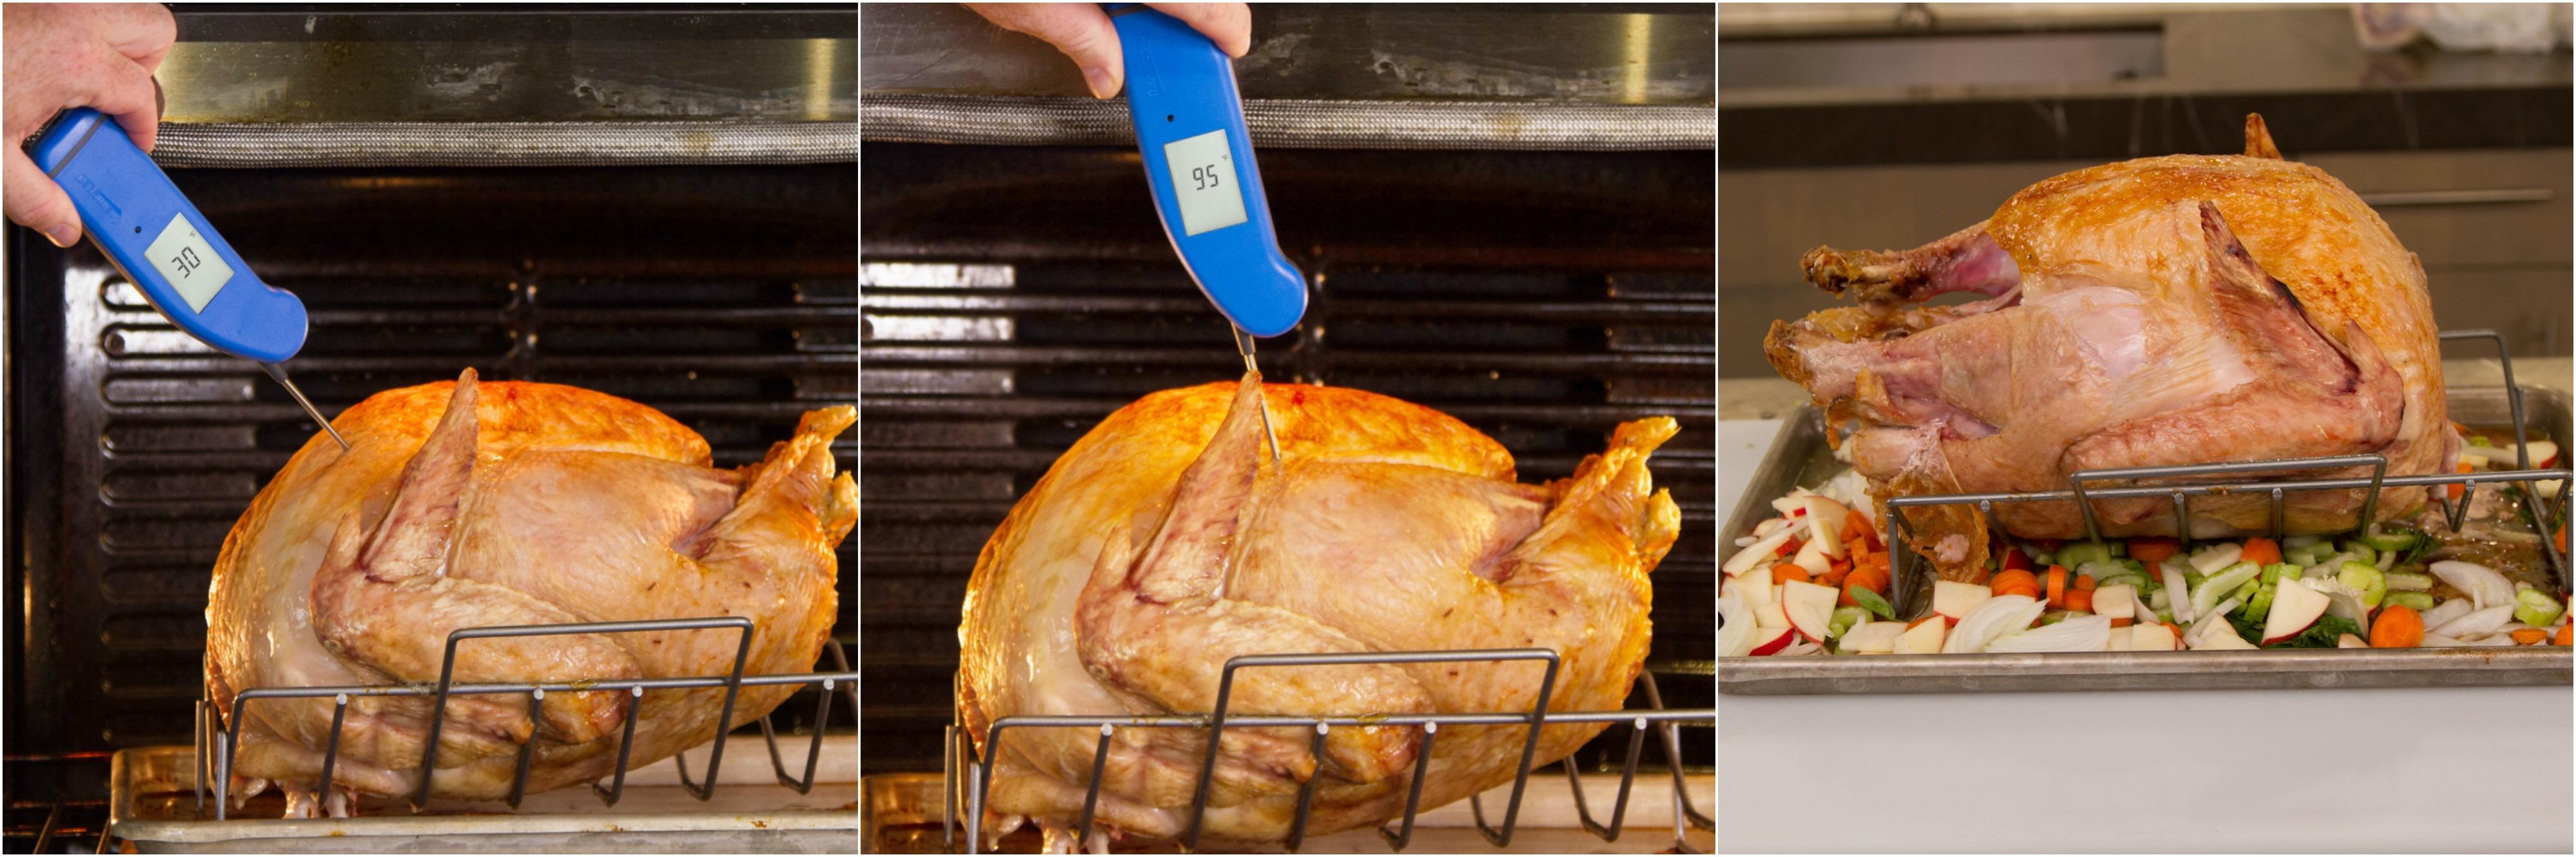 Think, hours to bake frozen turkey breast site